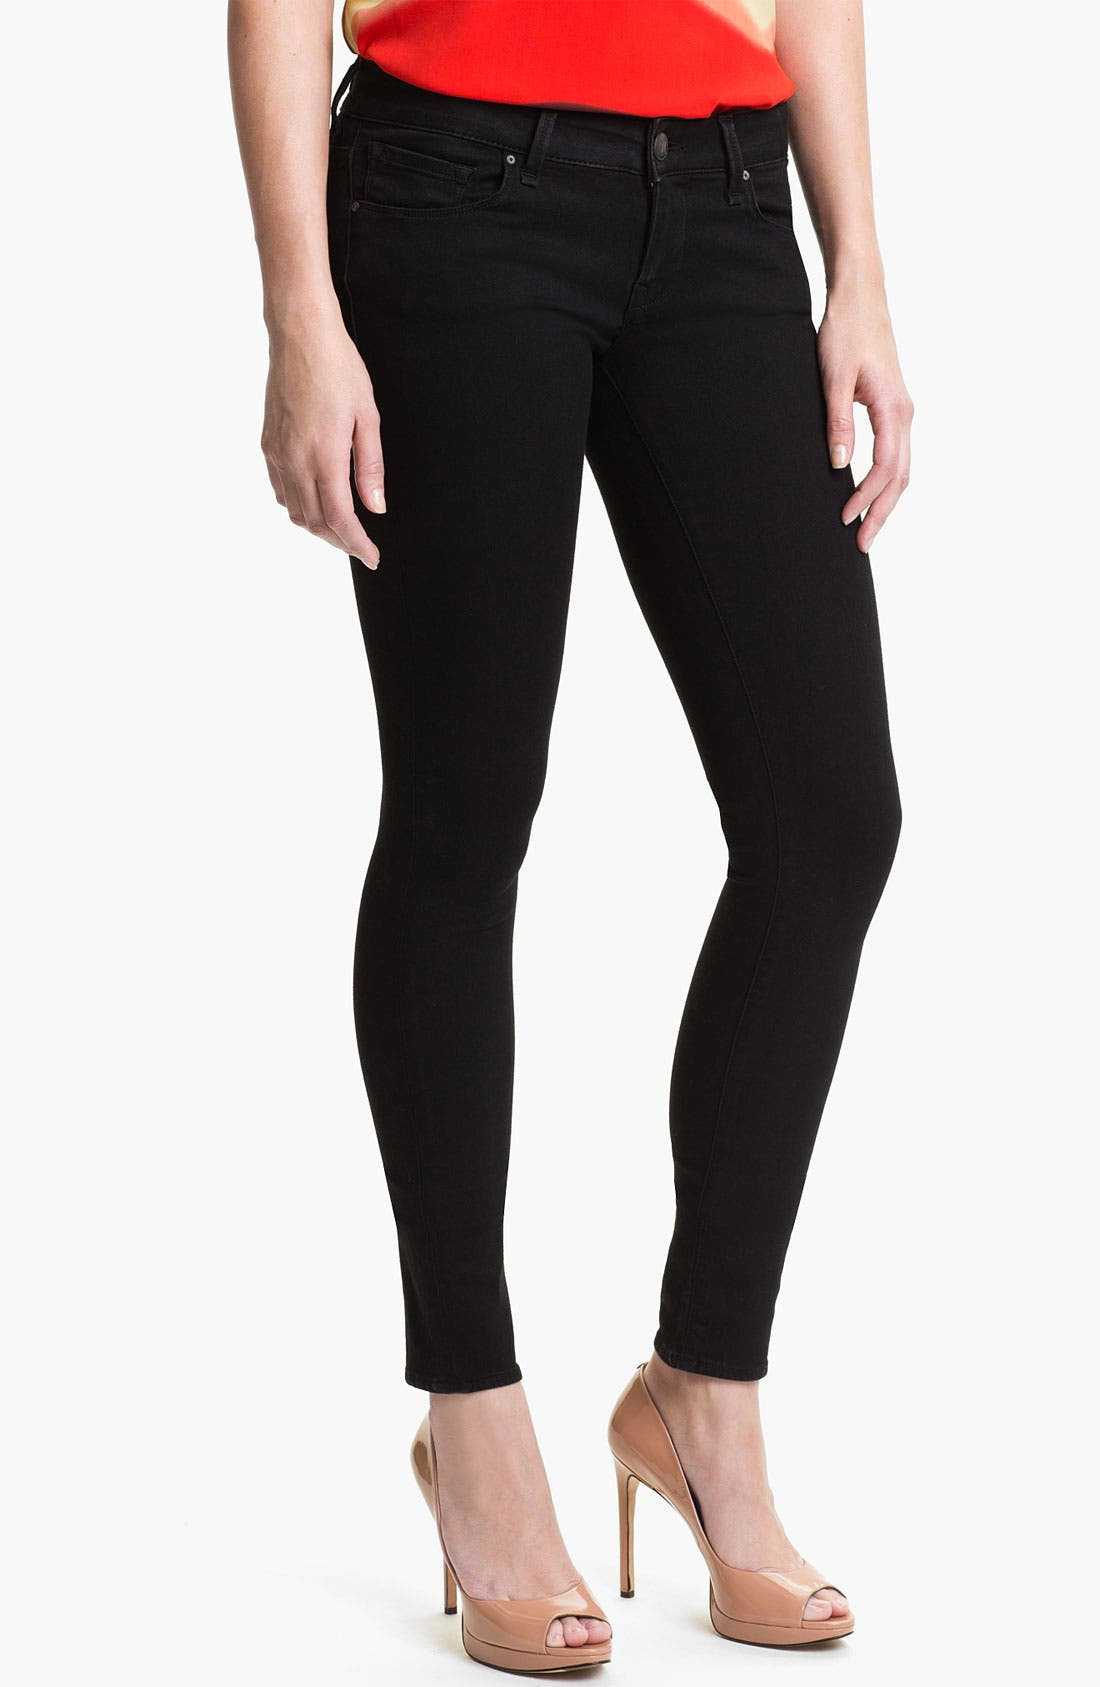 Main Image - Mavi Jeans 'Serena' Low Rise Super Skinny Jeans (Black Shanti) (Online Exclusive)